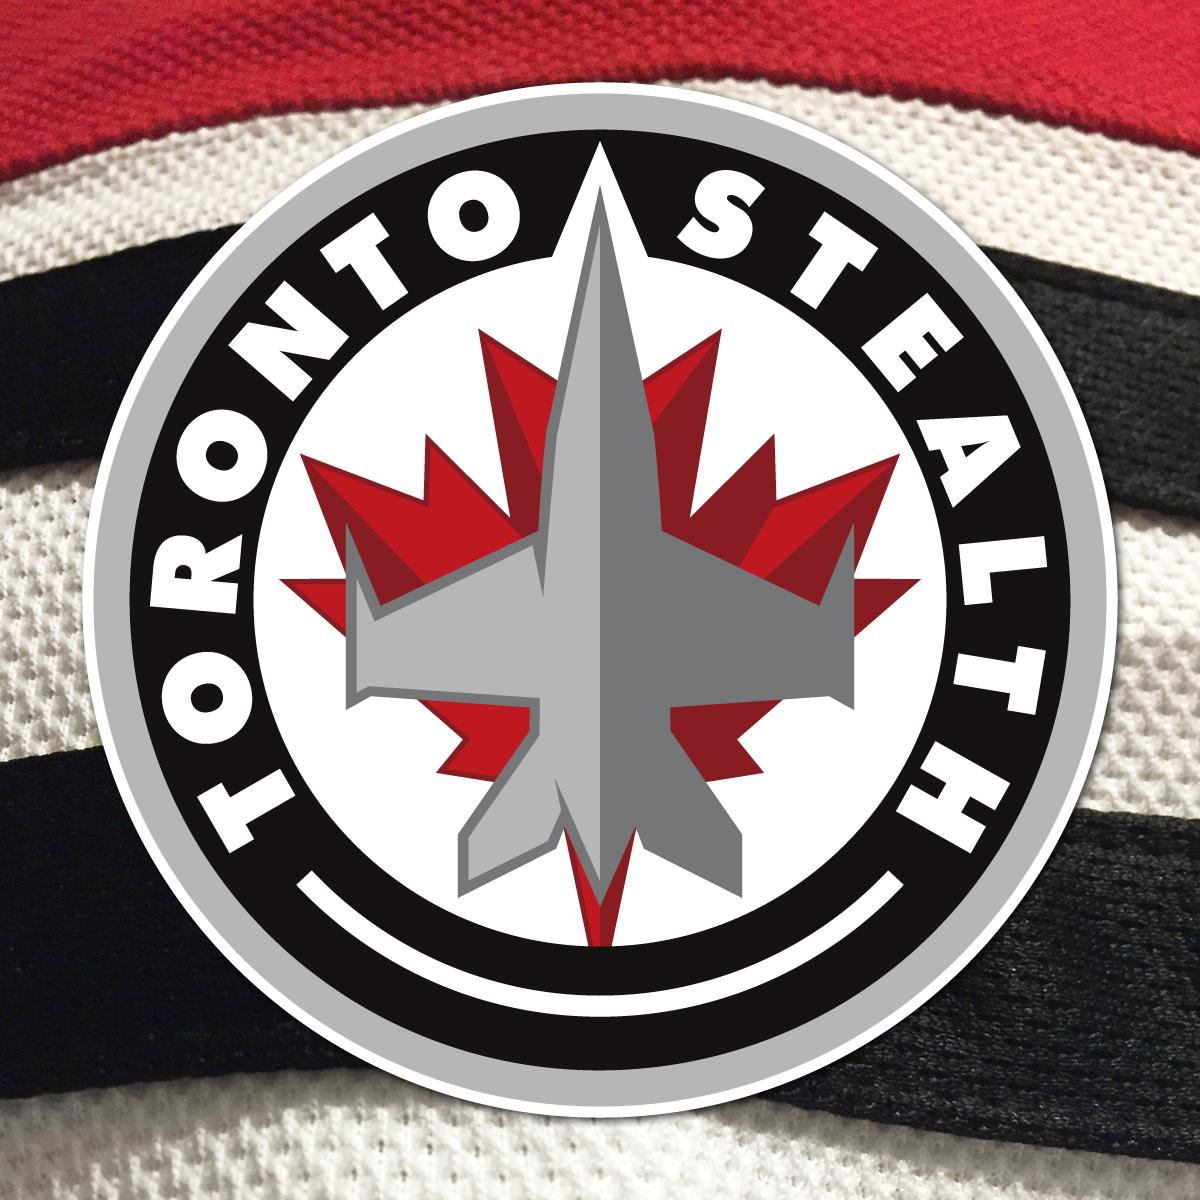 Toronto Stealth